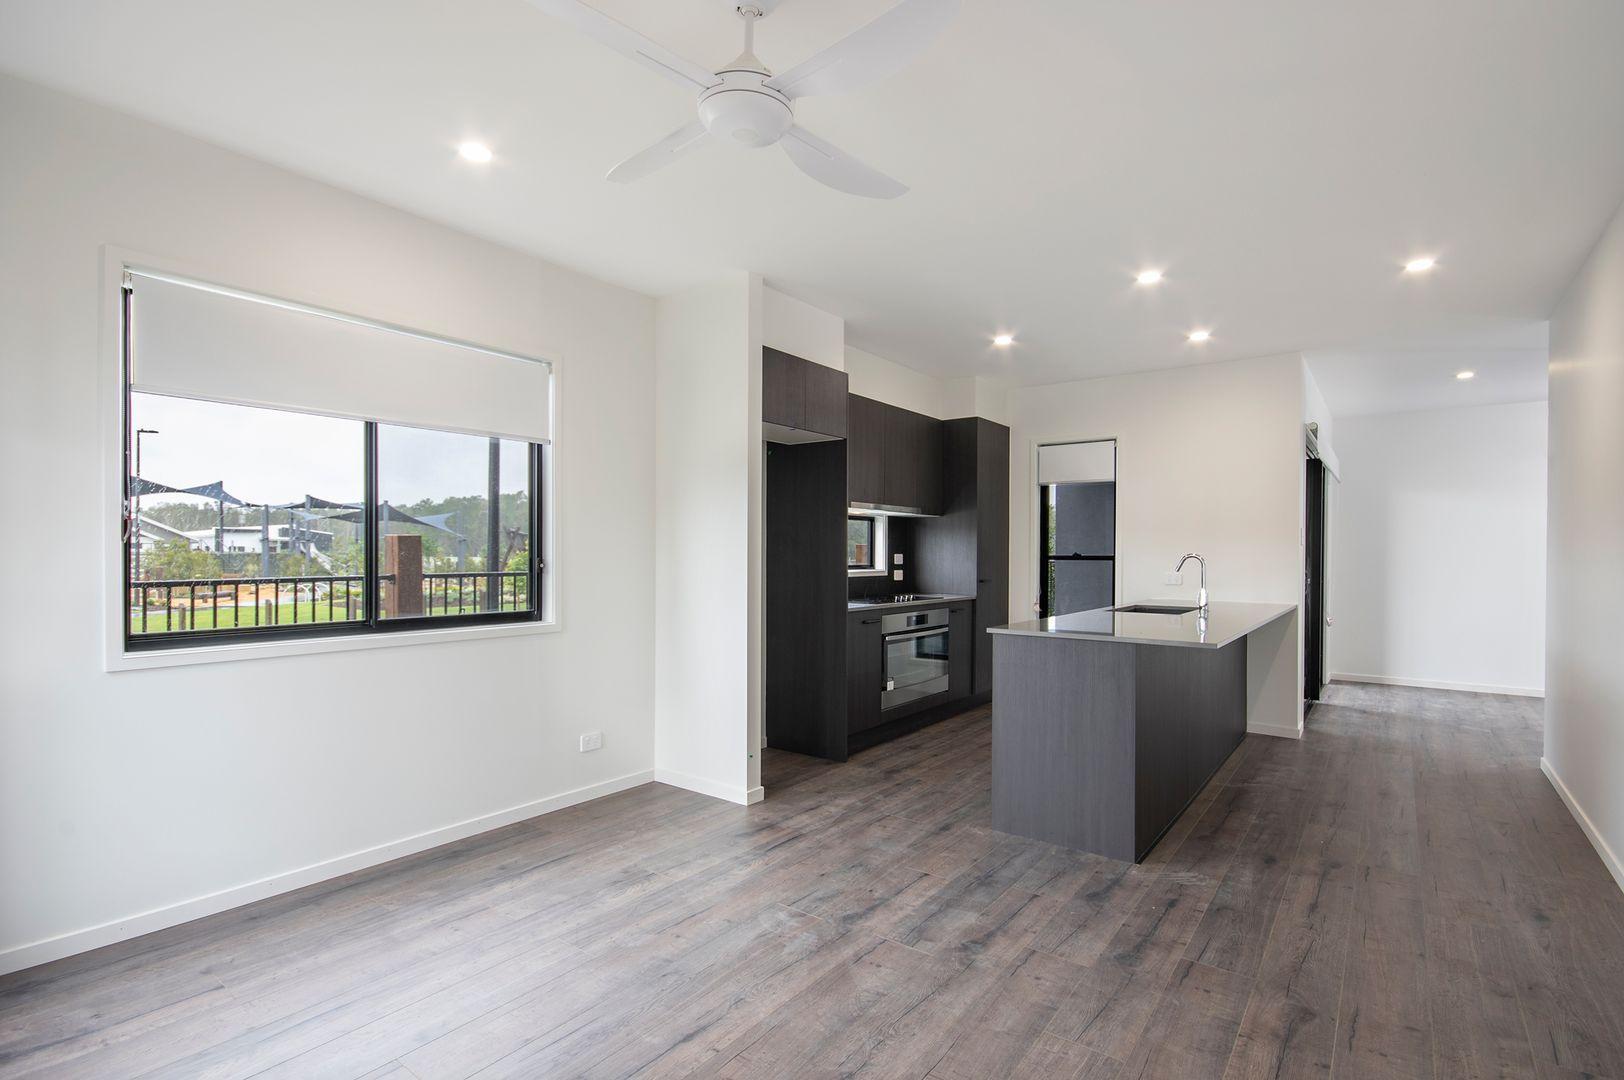 Lot 1578 Harry street, Aura,, Caloundra West QLD 4551, Image 1